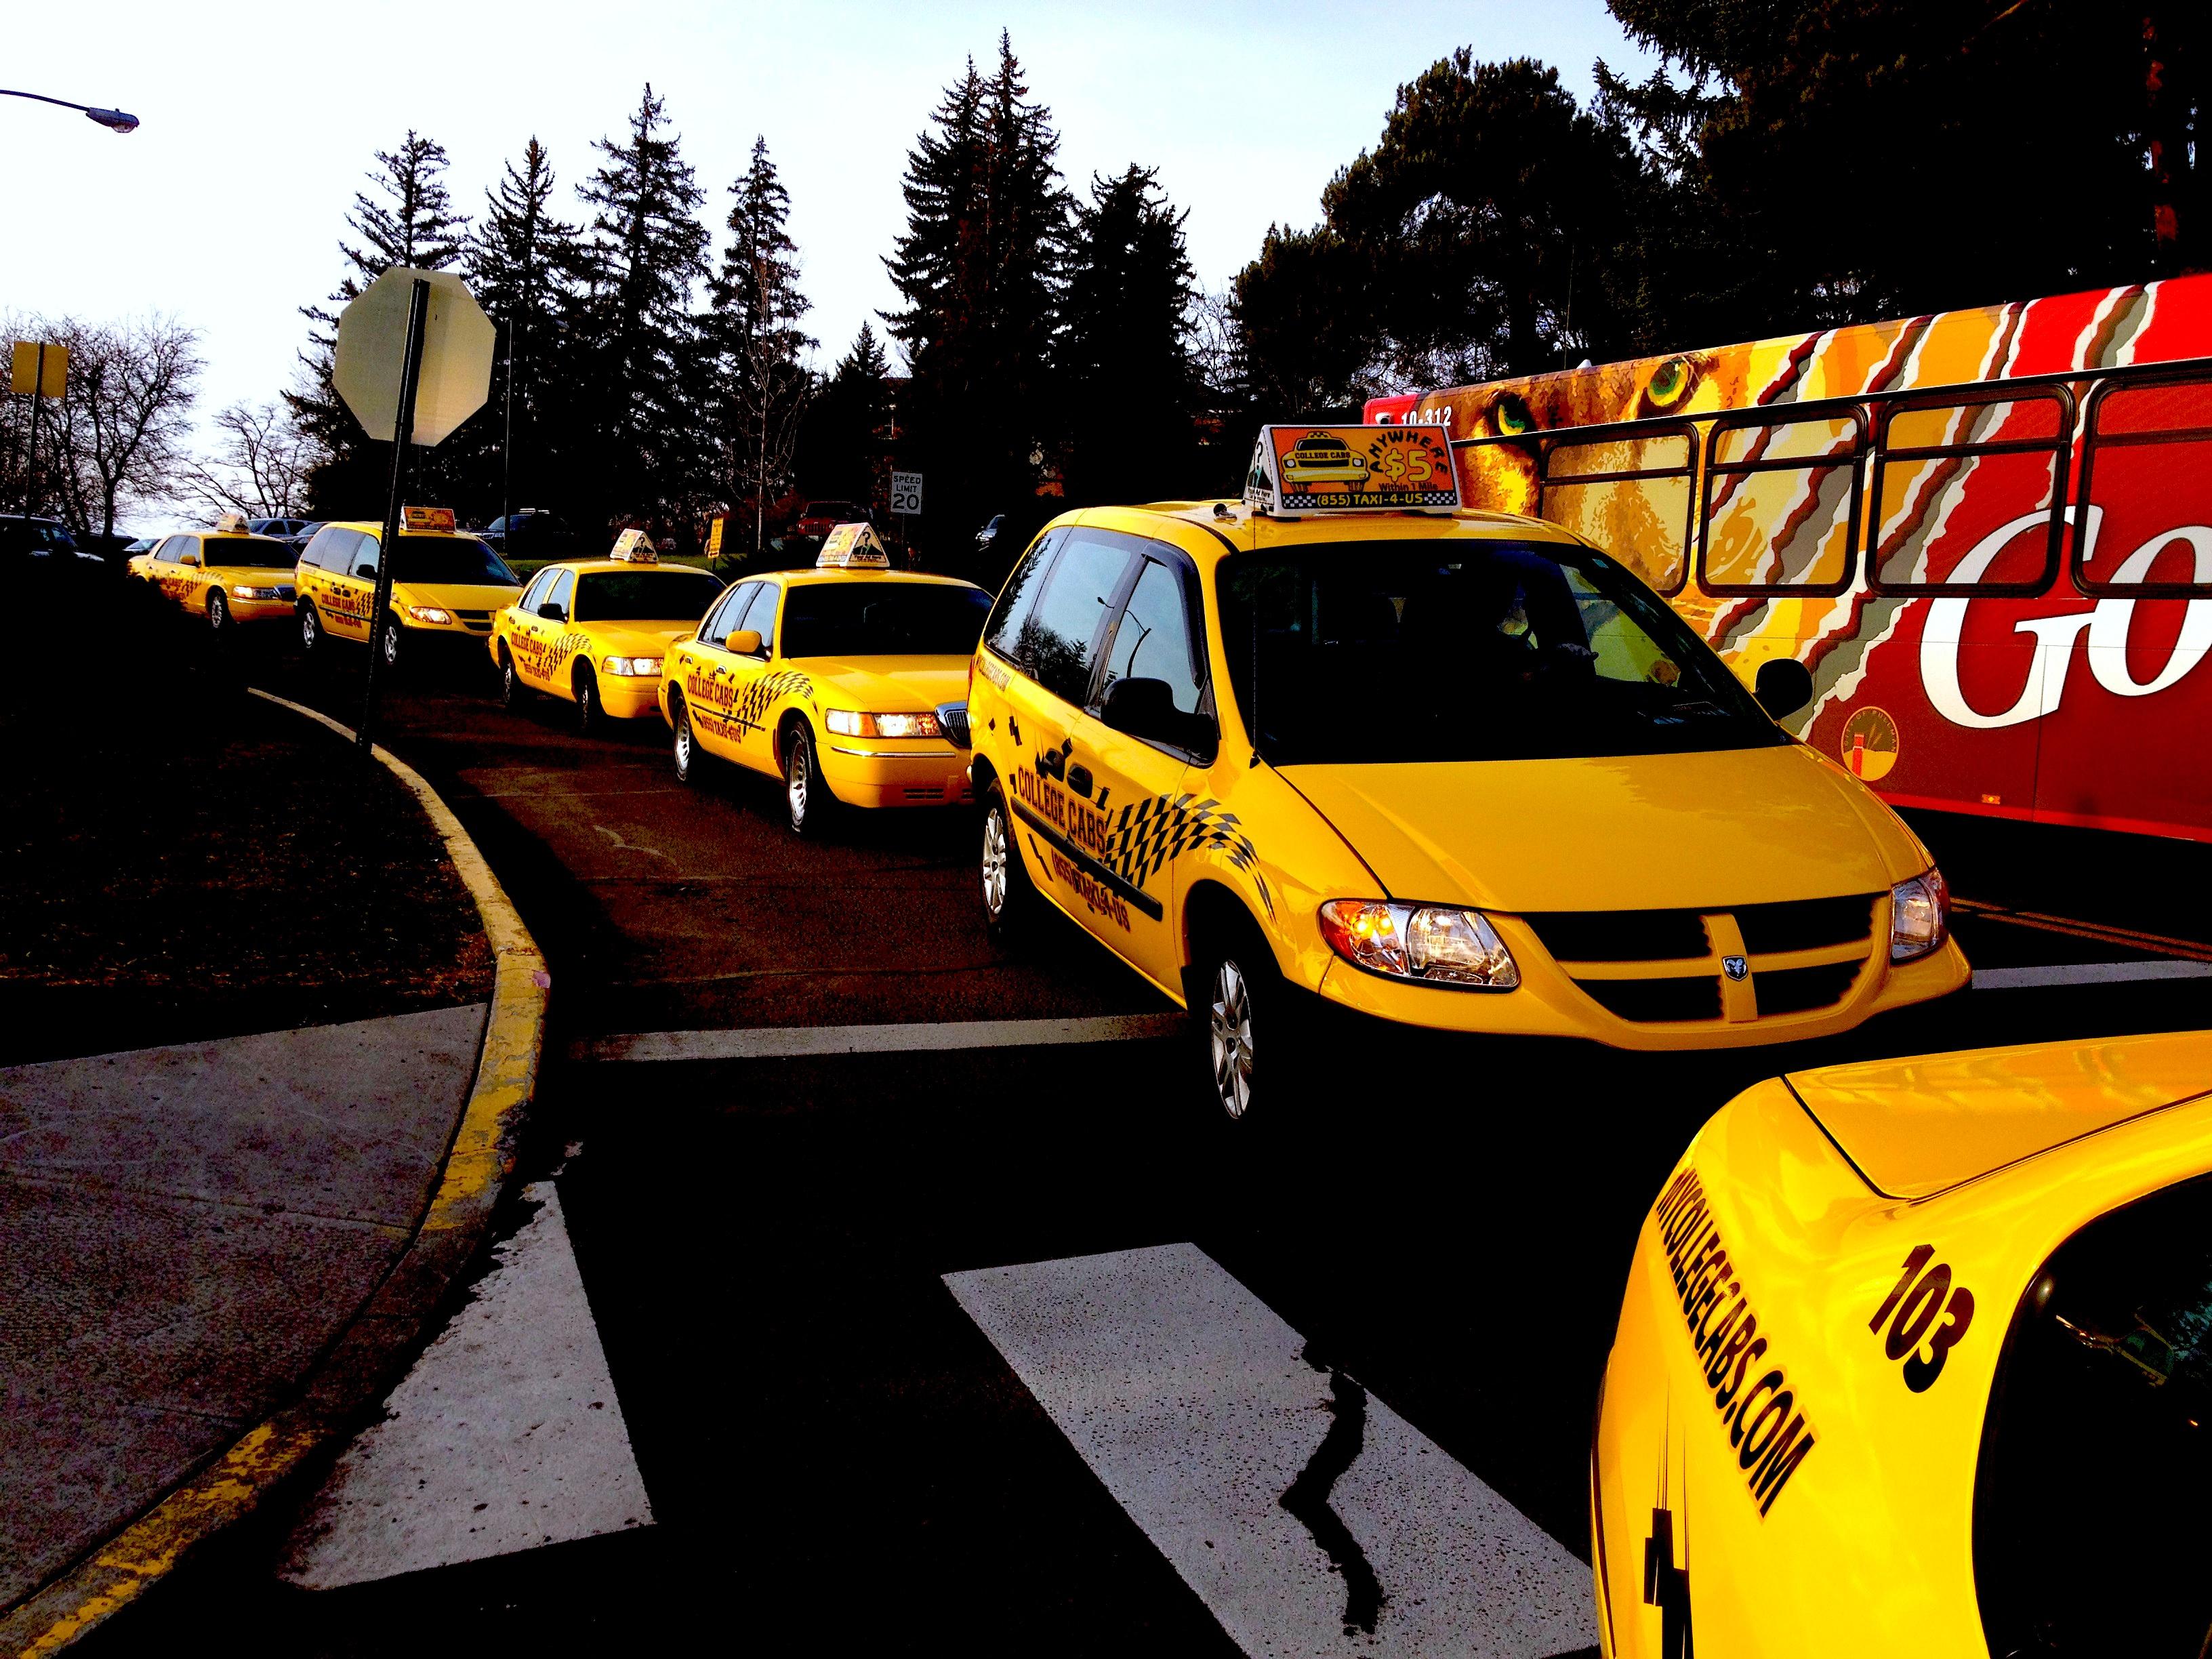 College Cabs Llc 2460 S Grand Ave Pullman Wa 99163 Yp Com